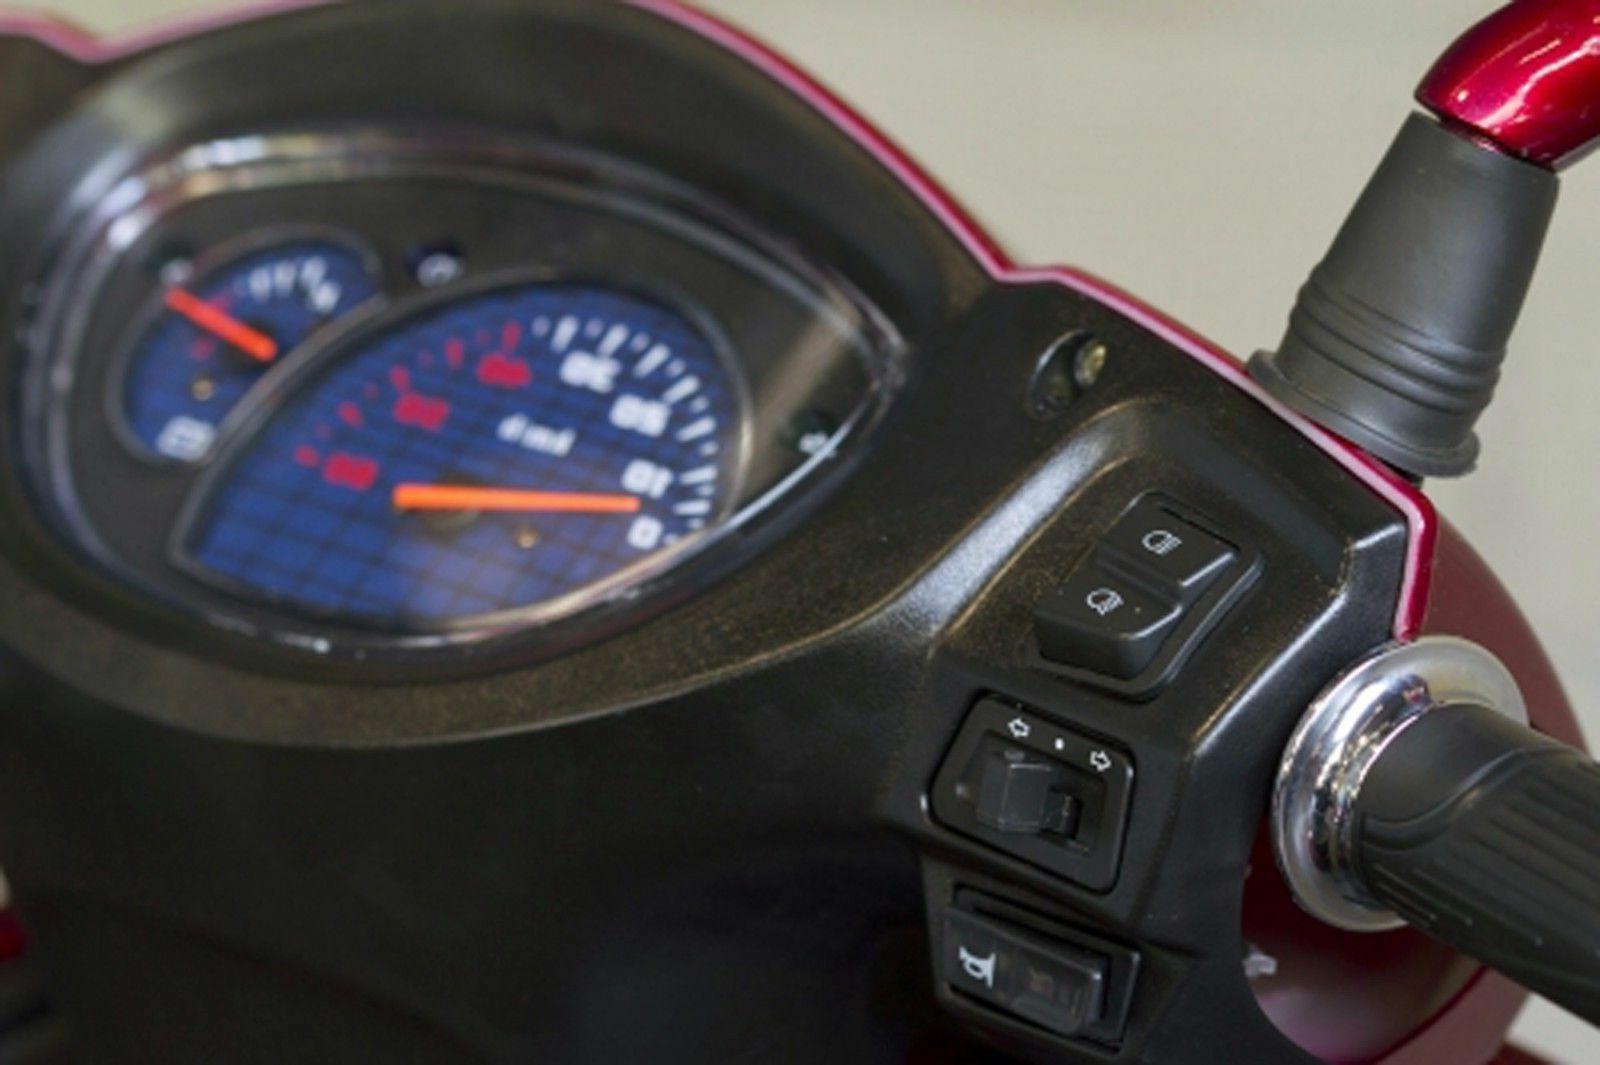 Silver Speedy EW-72 4 Wheel Goes To mph, 500